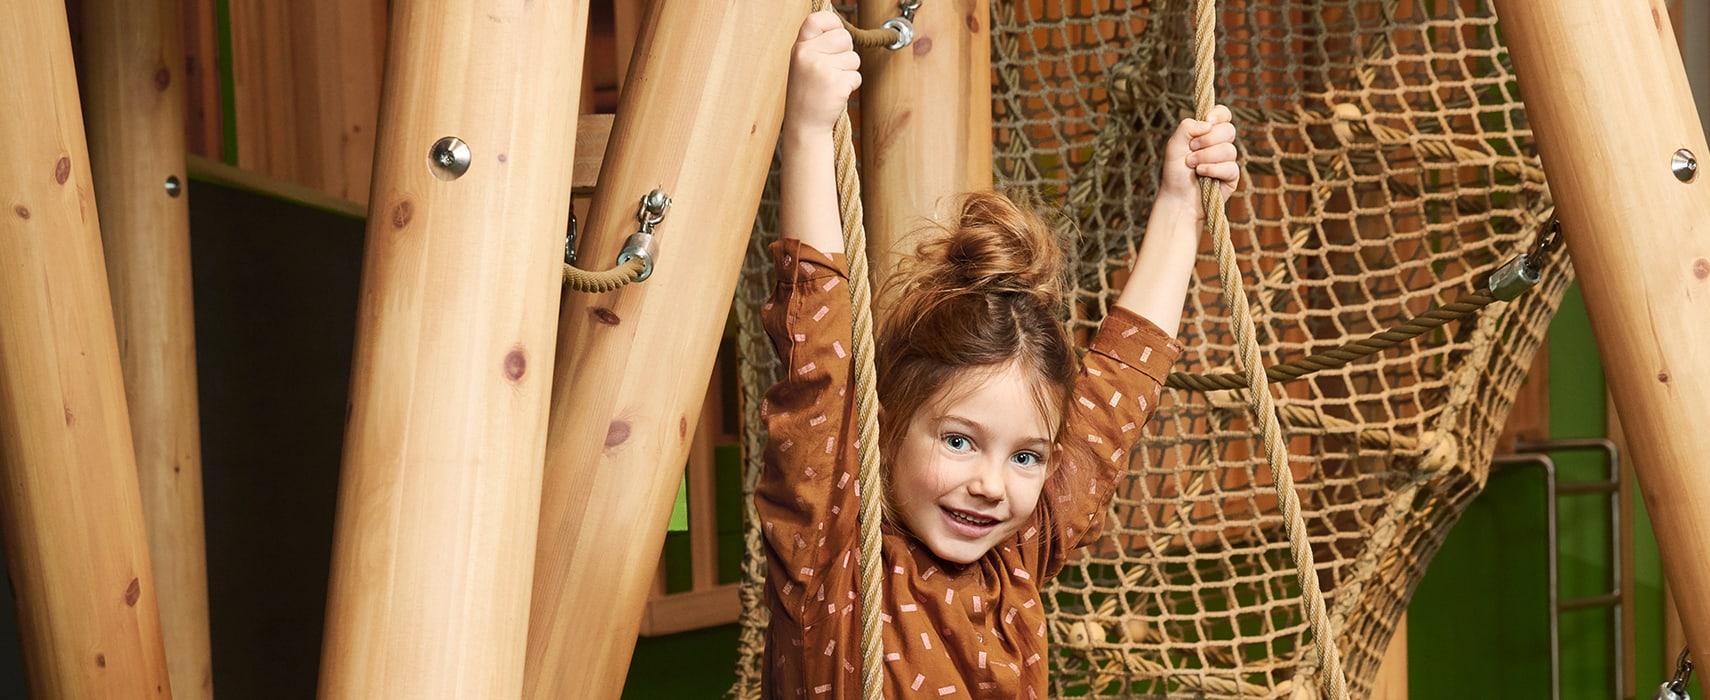 Mädchen hängt in den Seilen